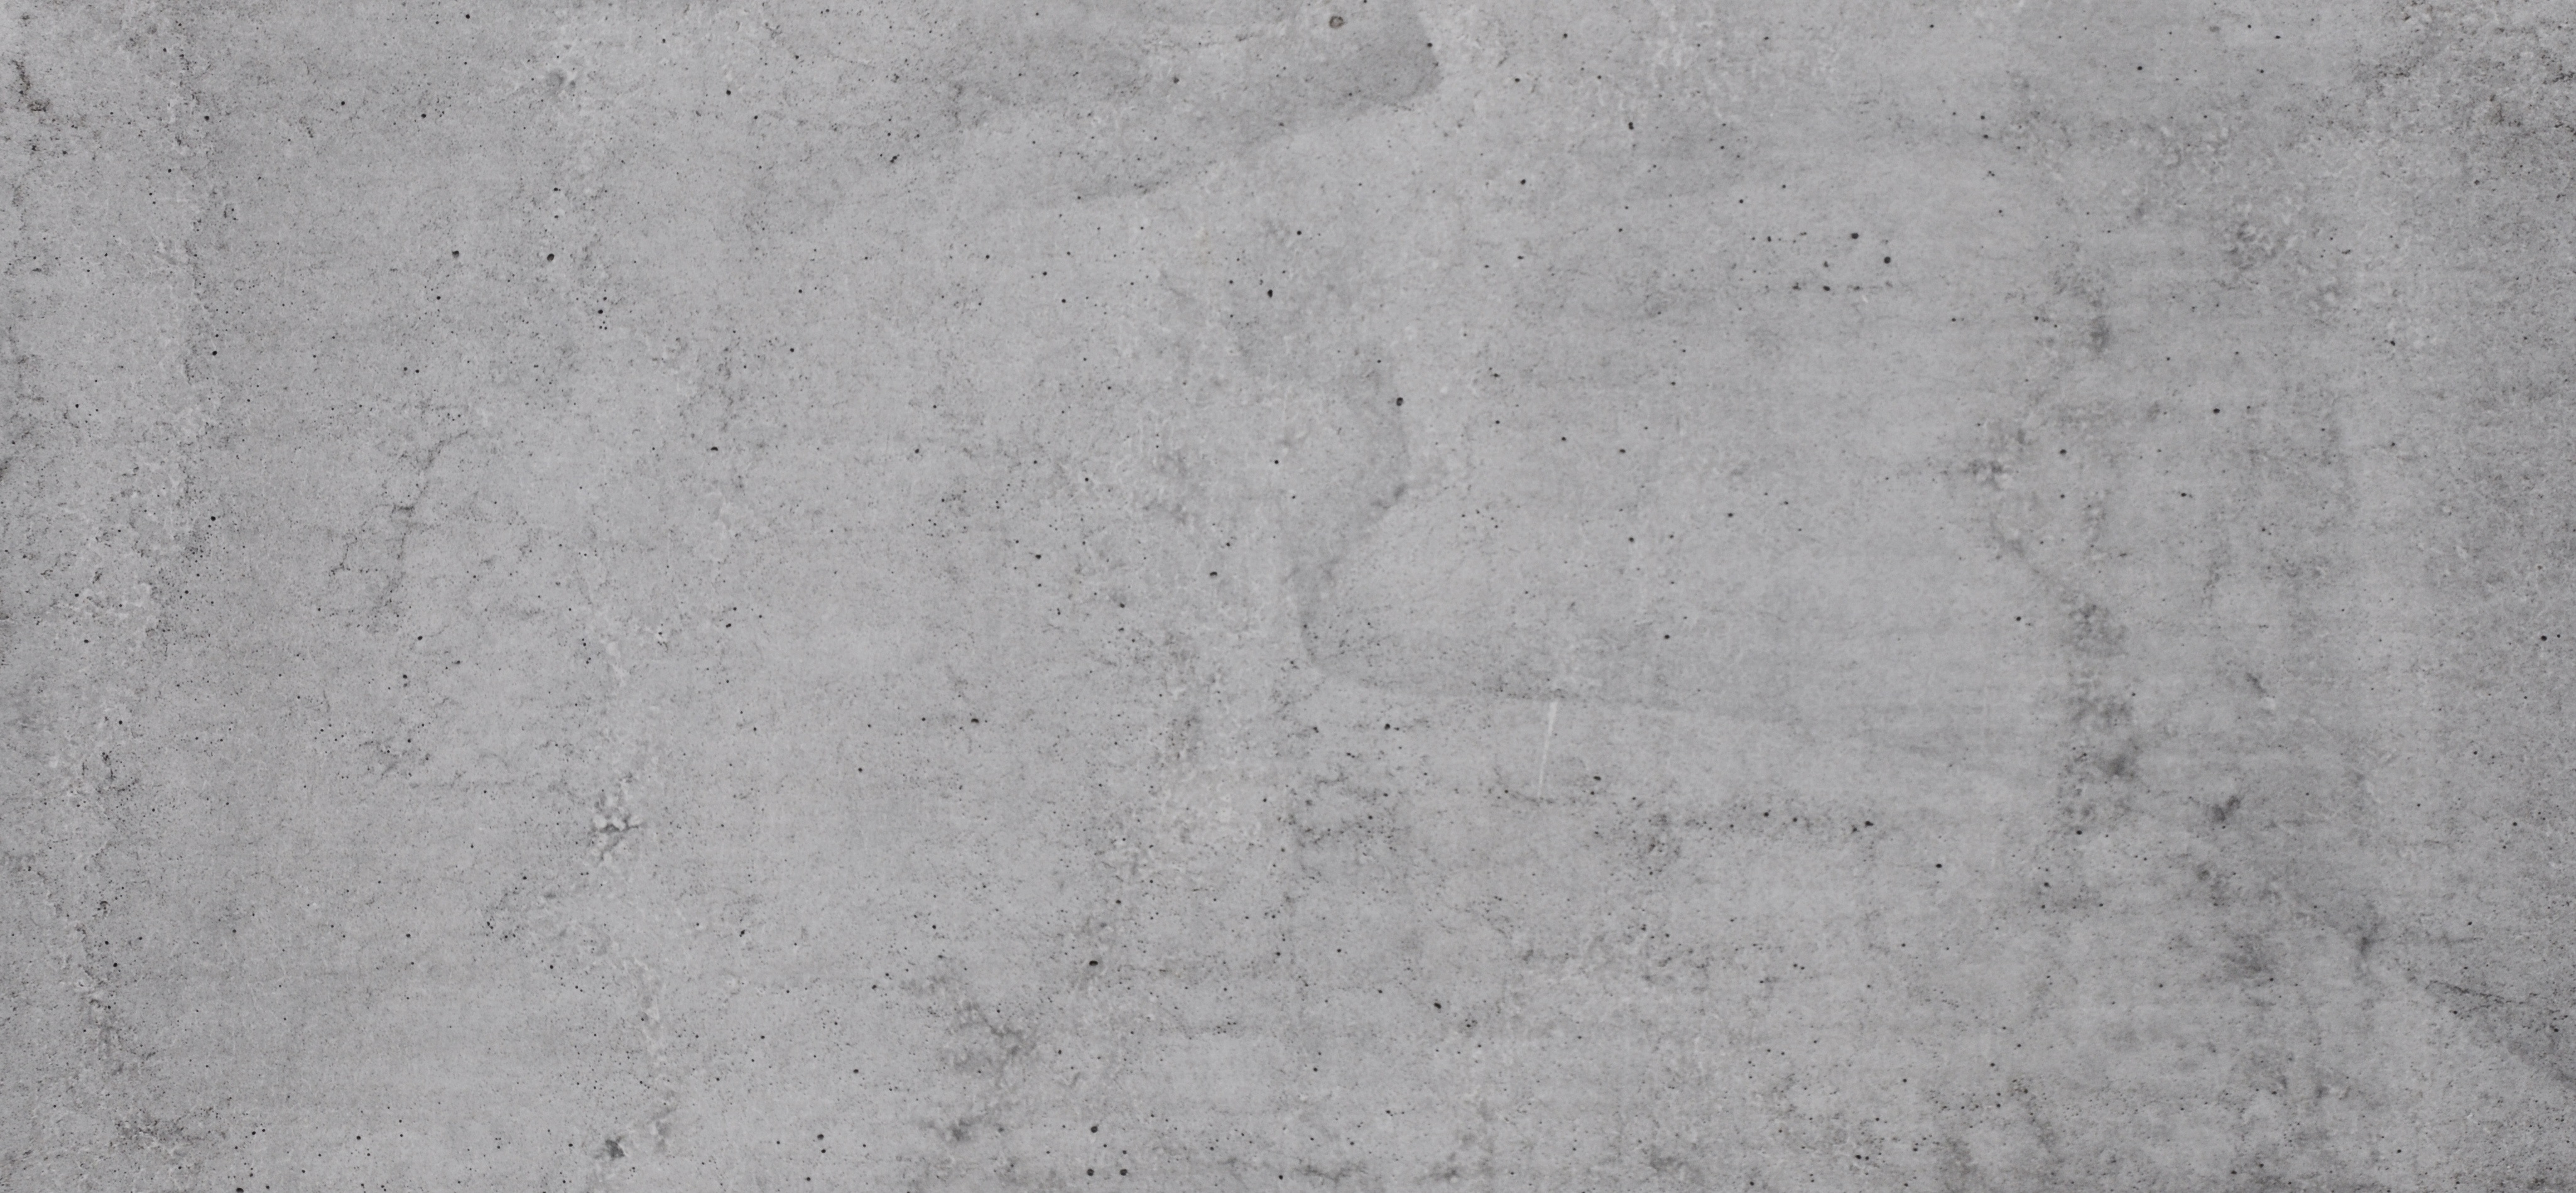 Structure Texture Floor City Urban Wall 1173885 Pxhere Com